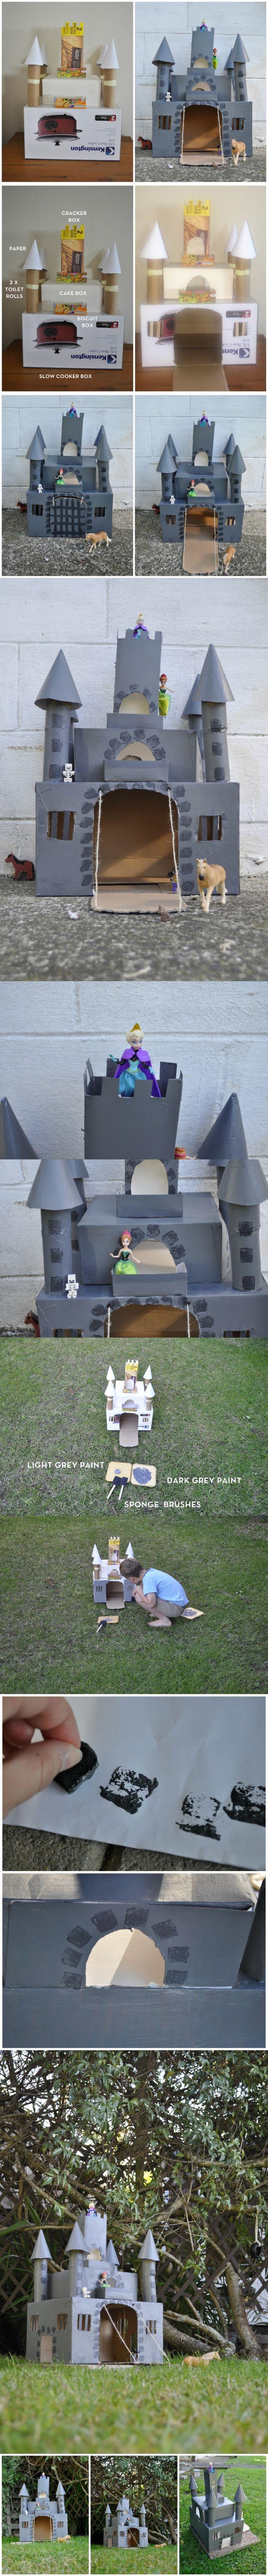 Divertido castillo de cartón para niños - Muy Ingenioso